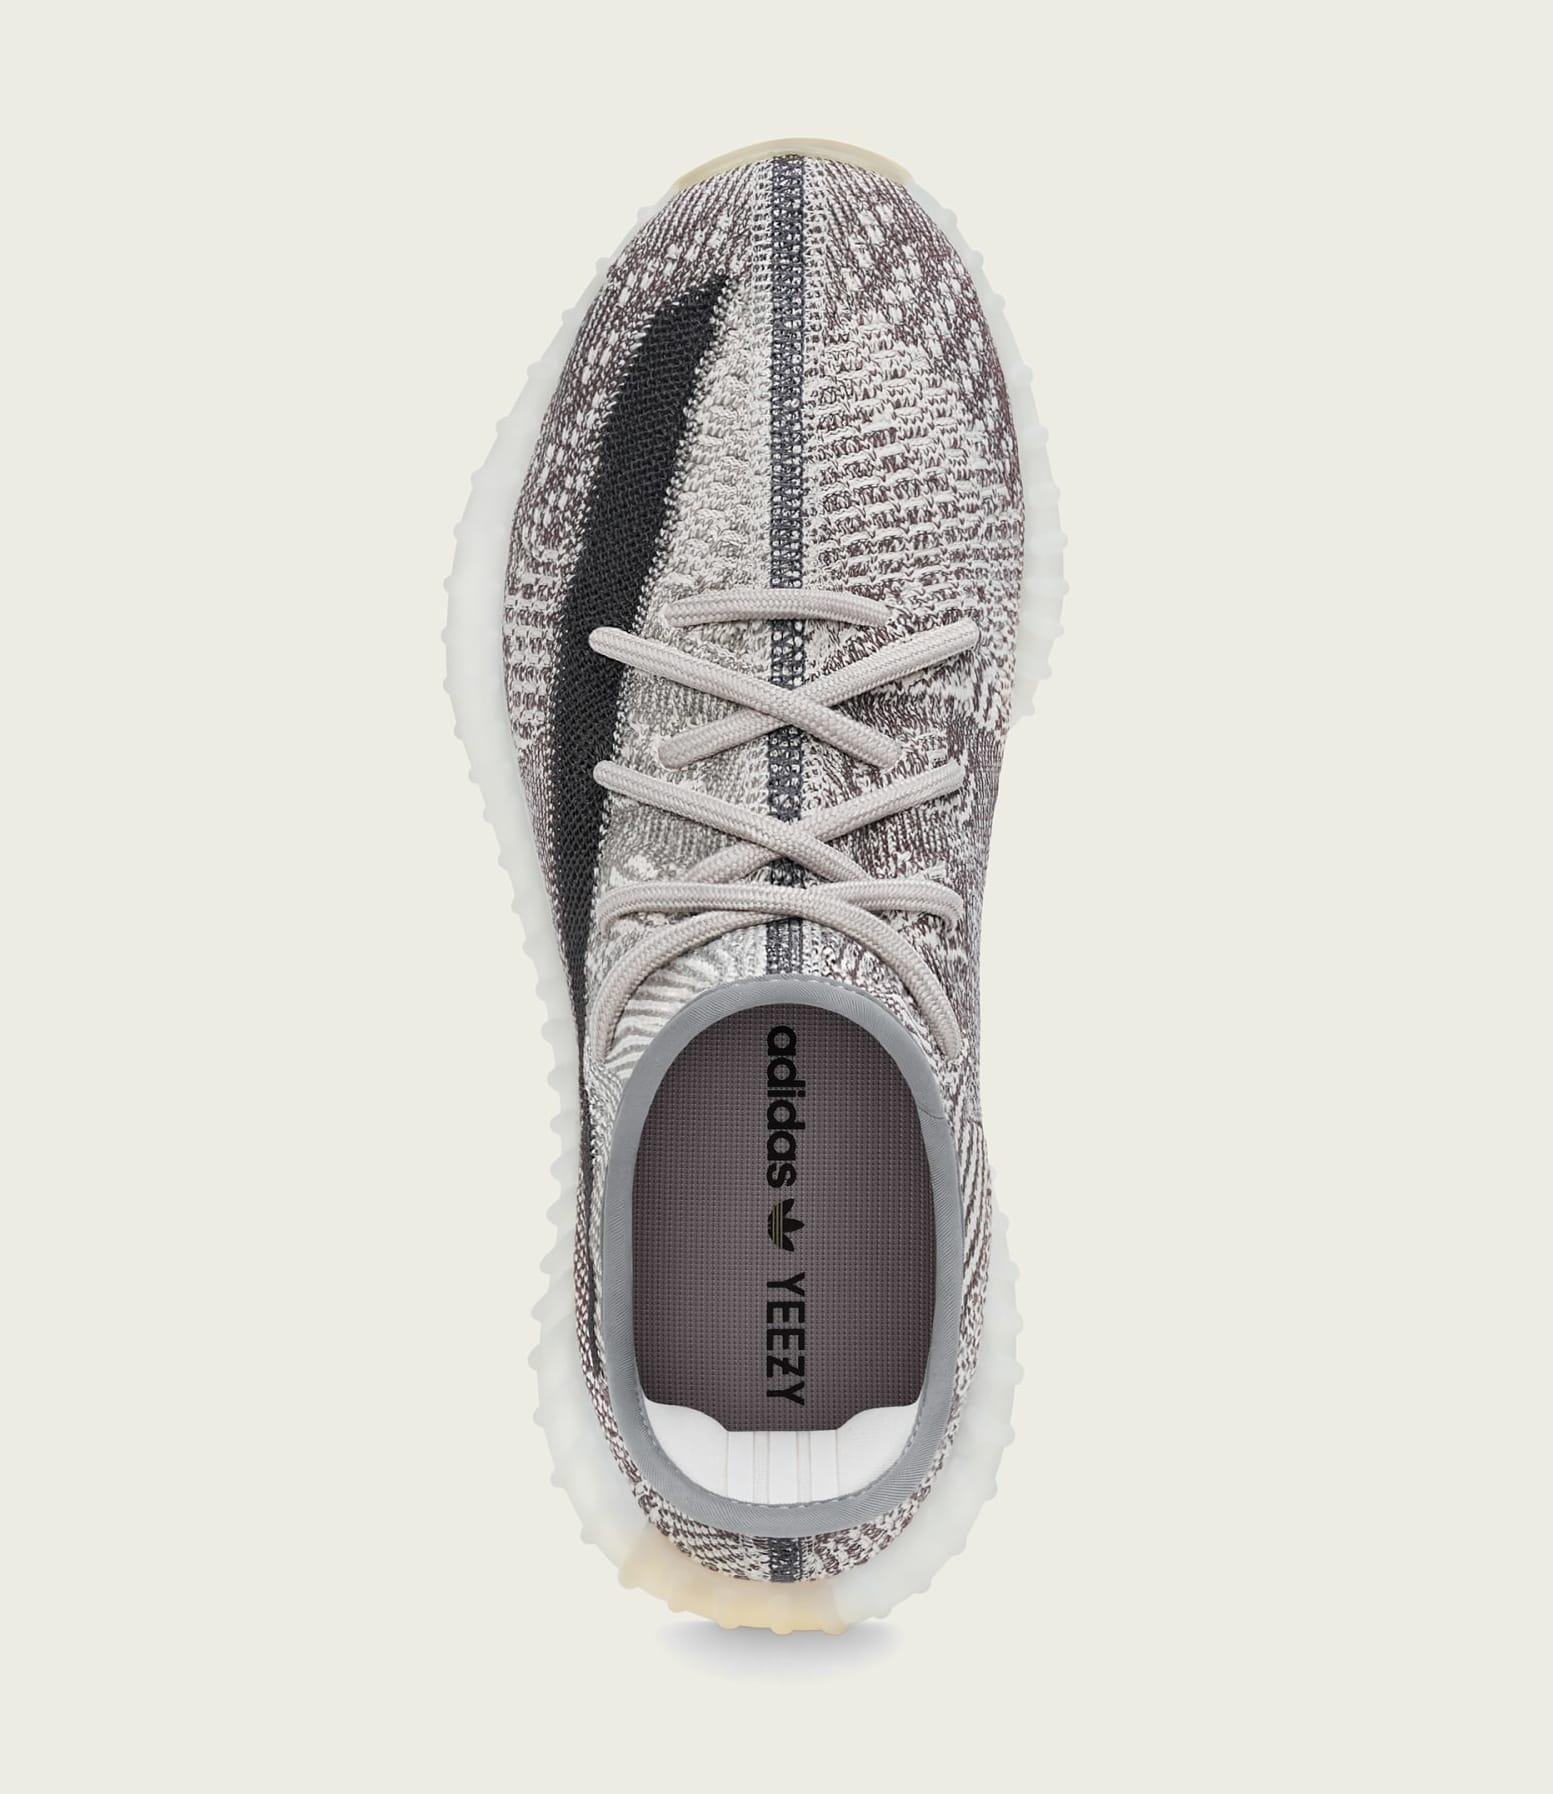 Adidas Yeezy Boost 350 V2 'Zyon' FZ1267 Top